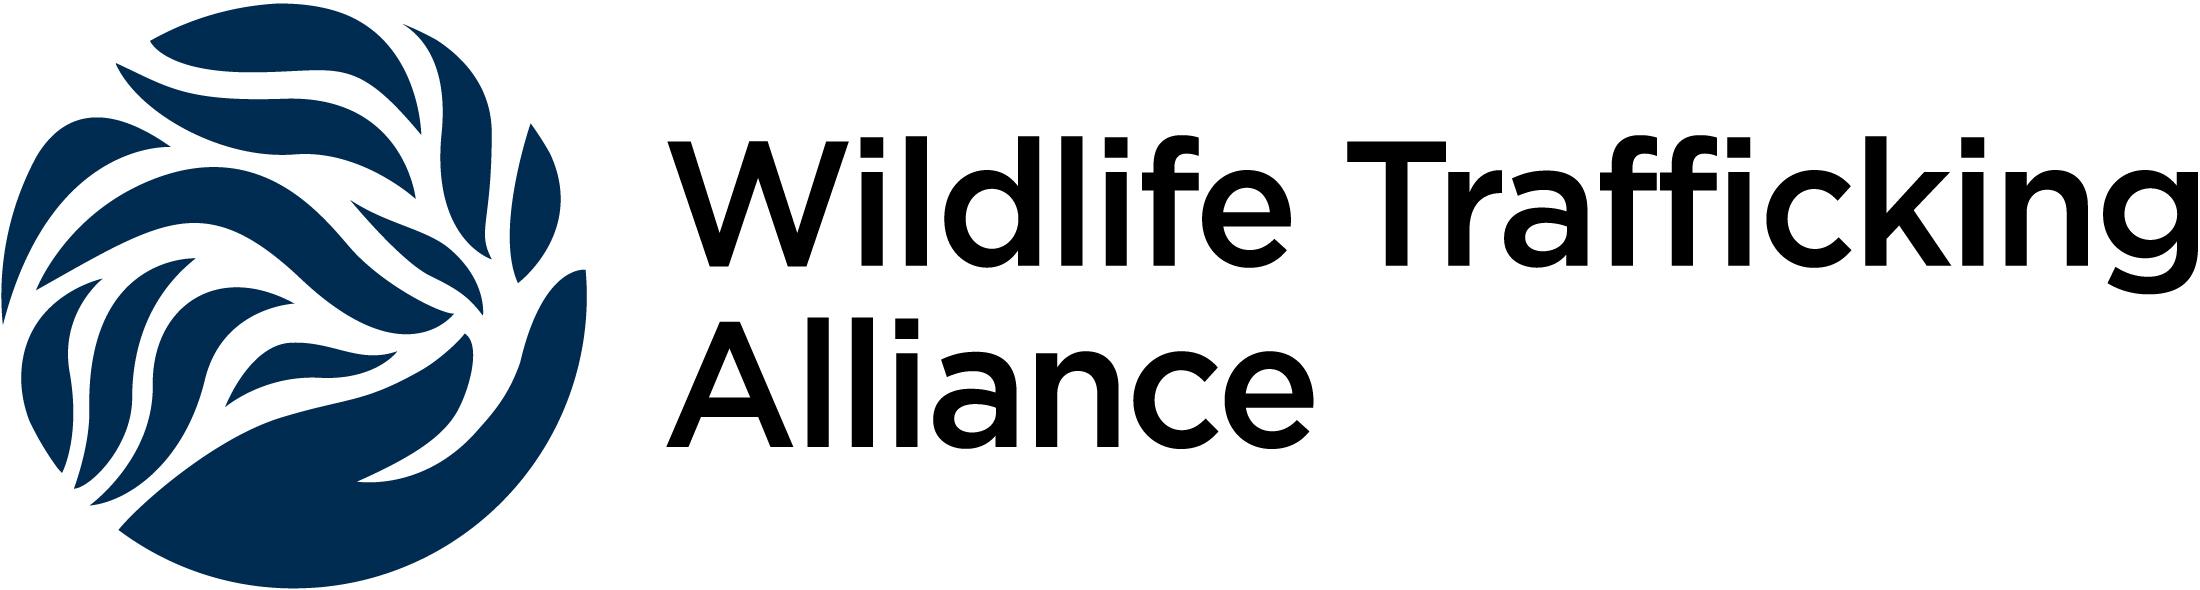 Image of WTA logo